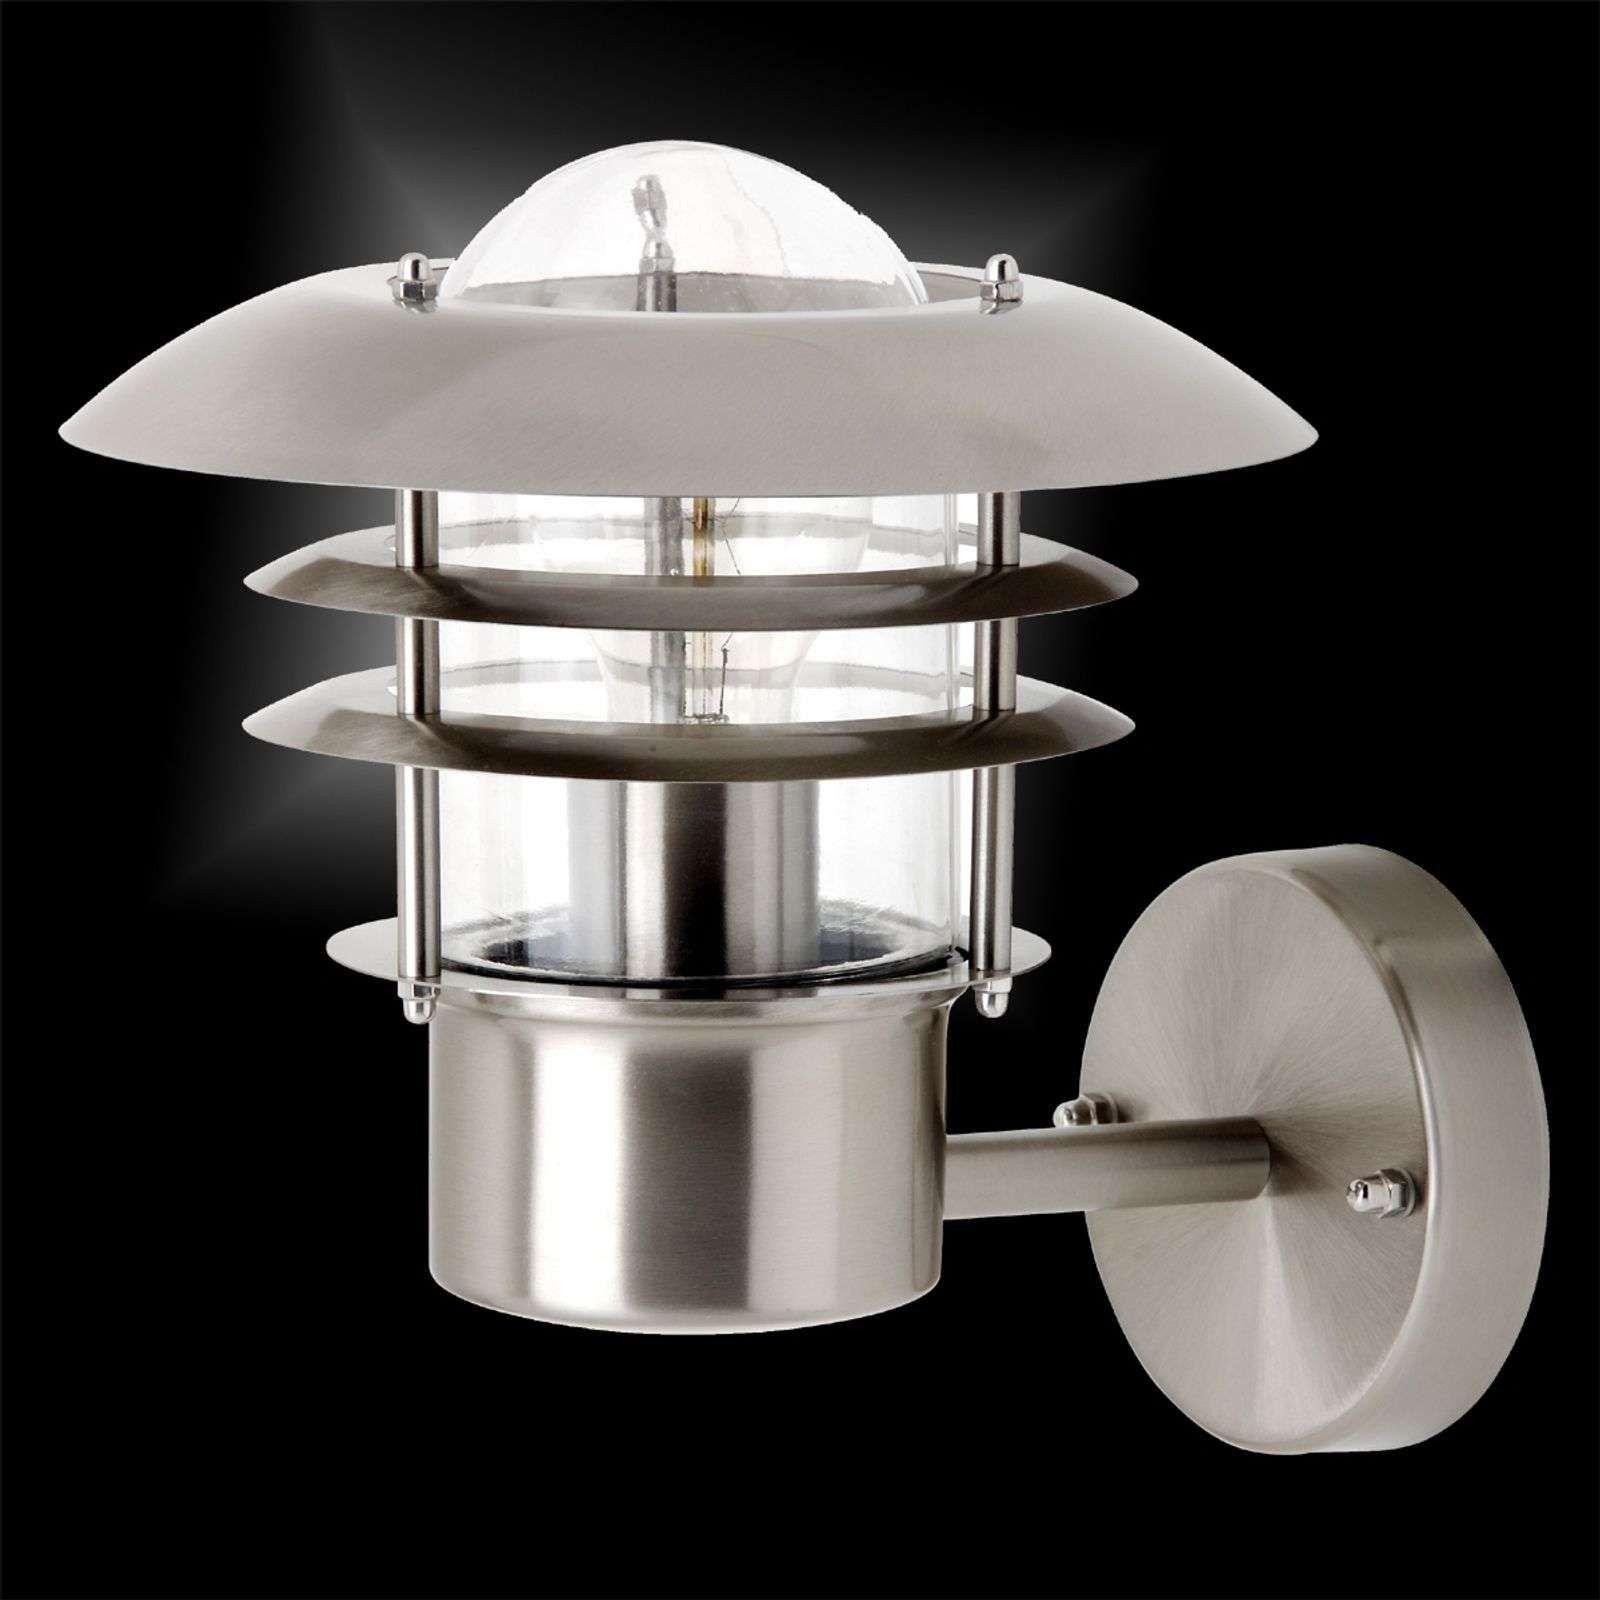 Wandlampen Buiten Karwei Wandlampe Aussen Edelstahl Wandlampe Mit Stecker Umbauen Wandlampe Holz K Buiten Wandverlichting Muurverlichting Energiebesparing